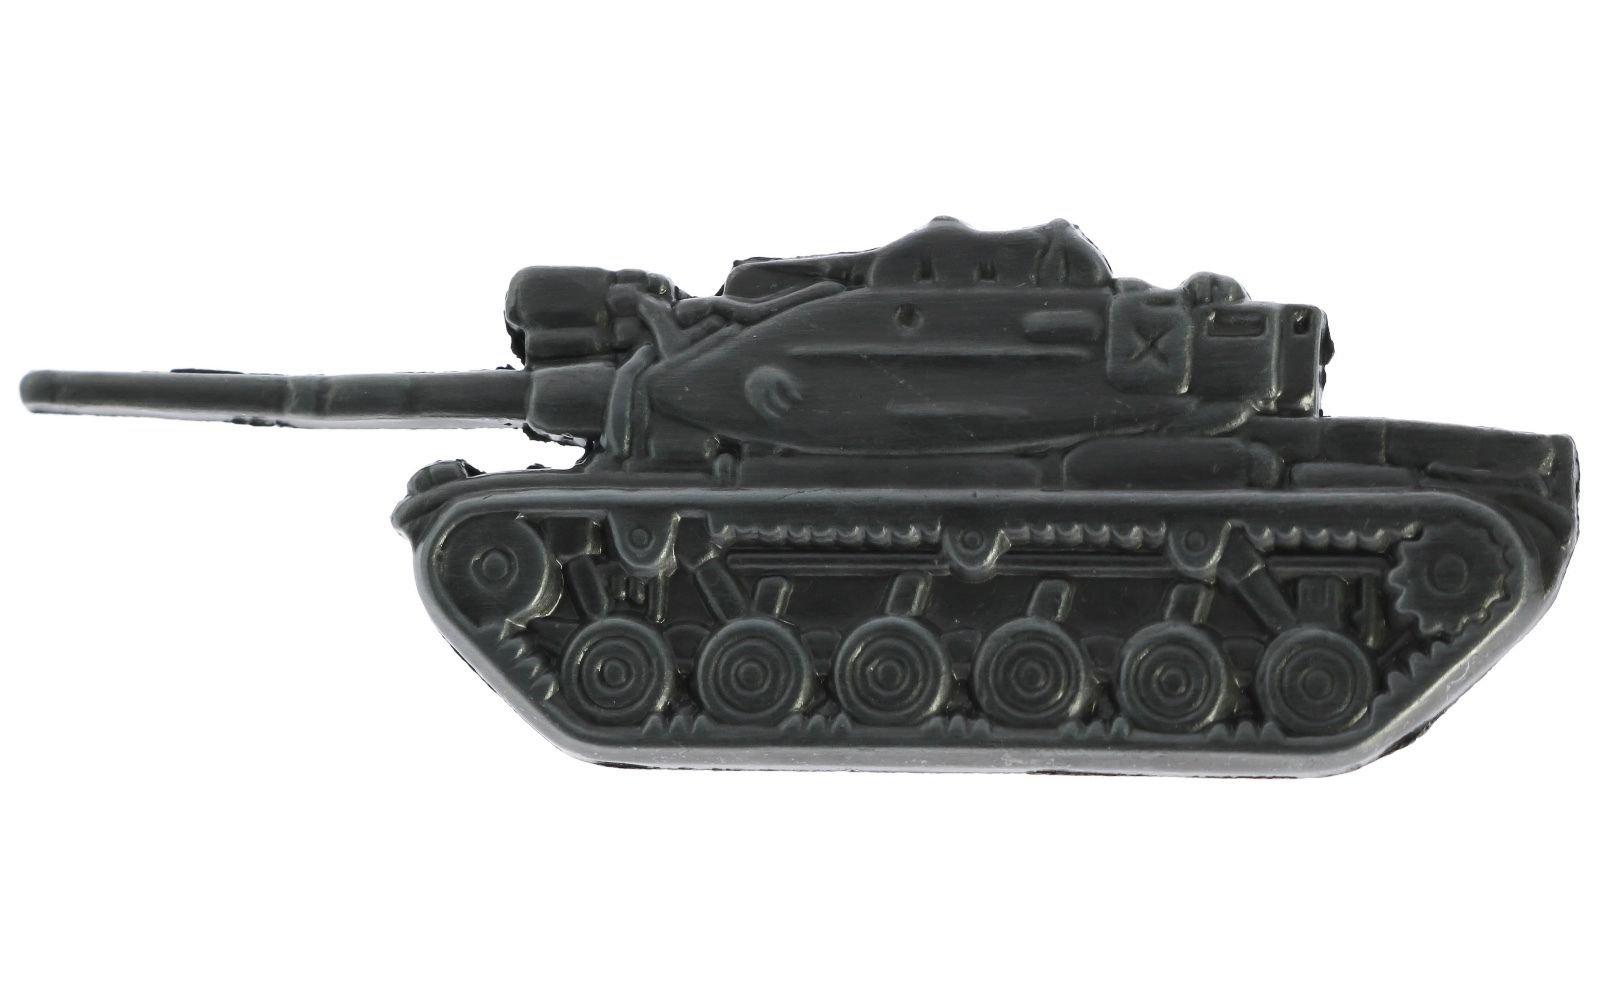 Miniature Replica Military Tank M60-A1 Patton Hat or Lapel Pin H16136D65